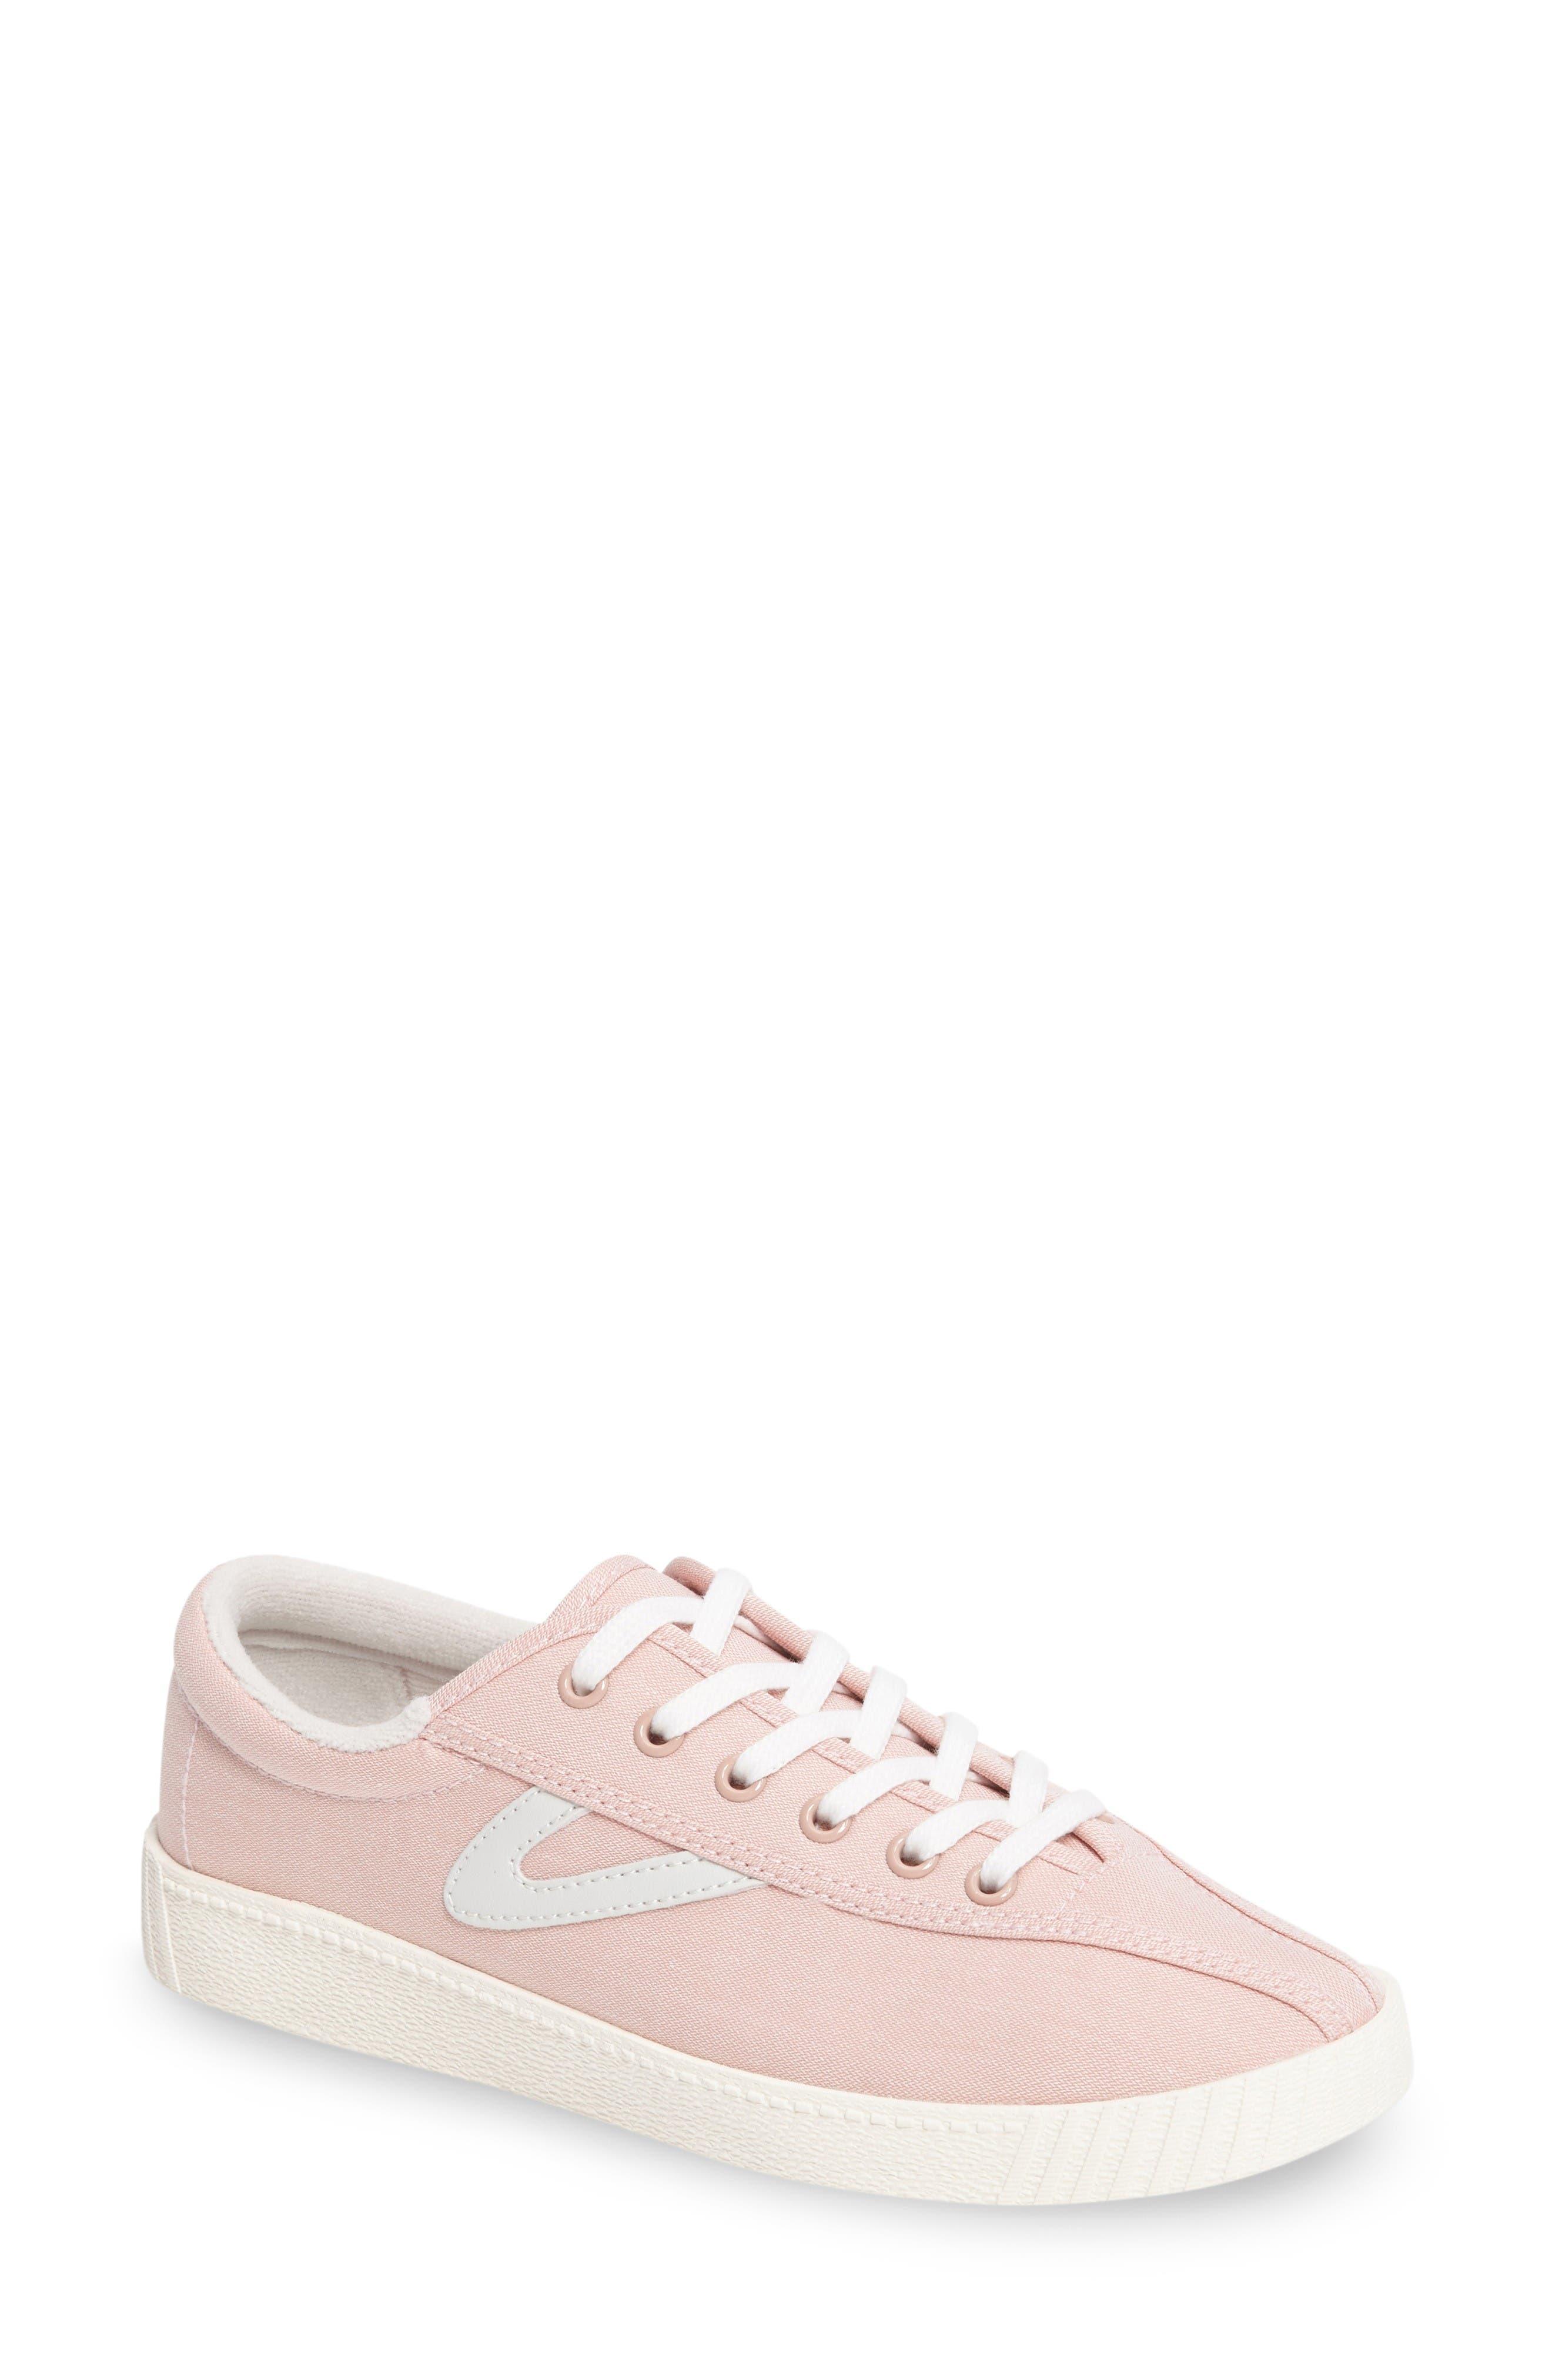 Main Image - Tretorn 'Nylite' Sneaker (Women)